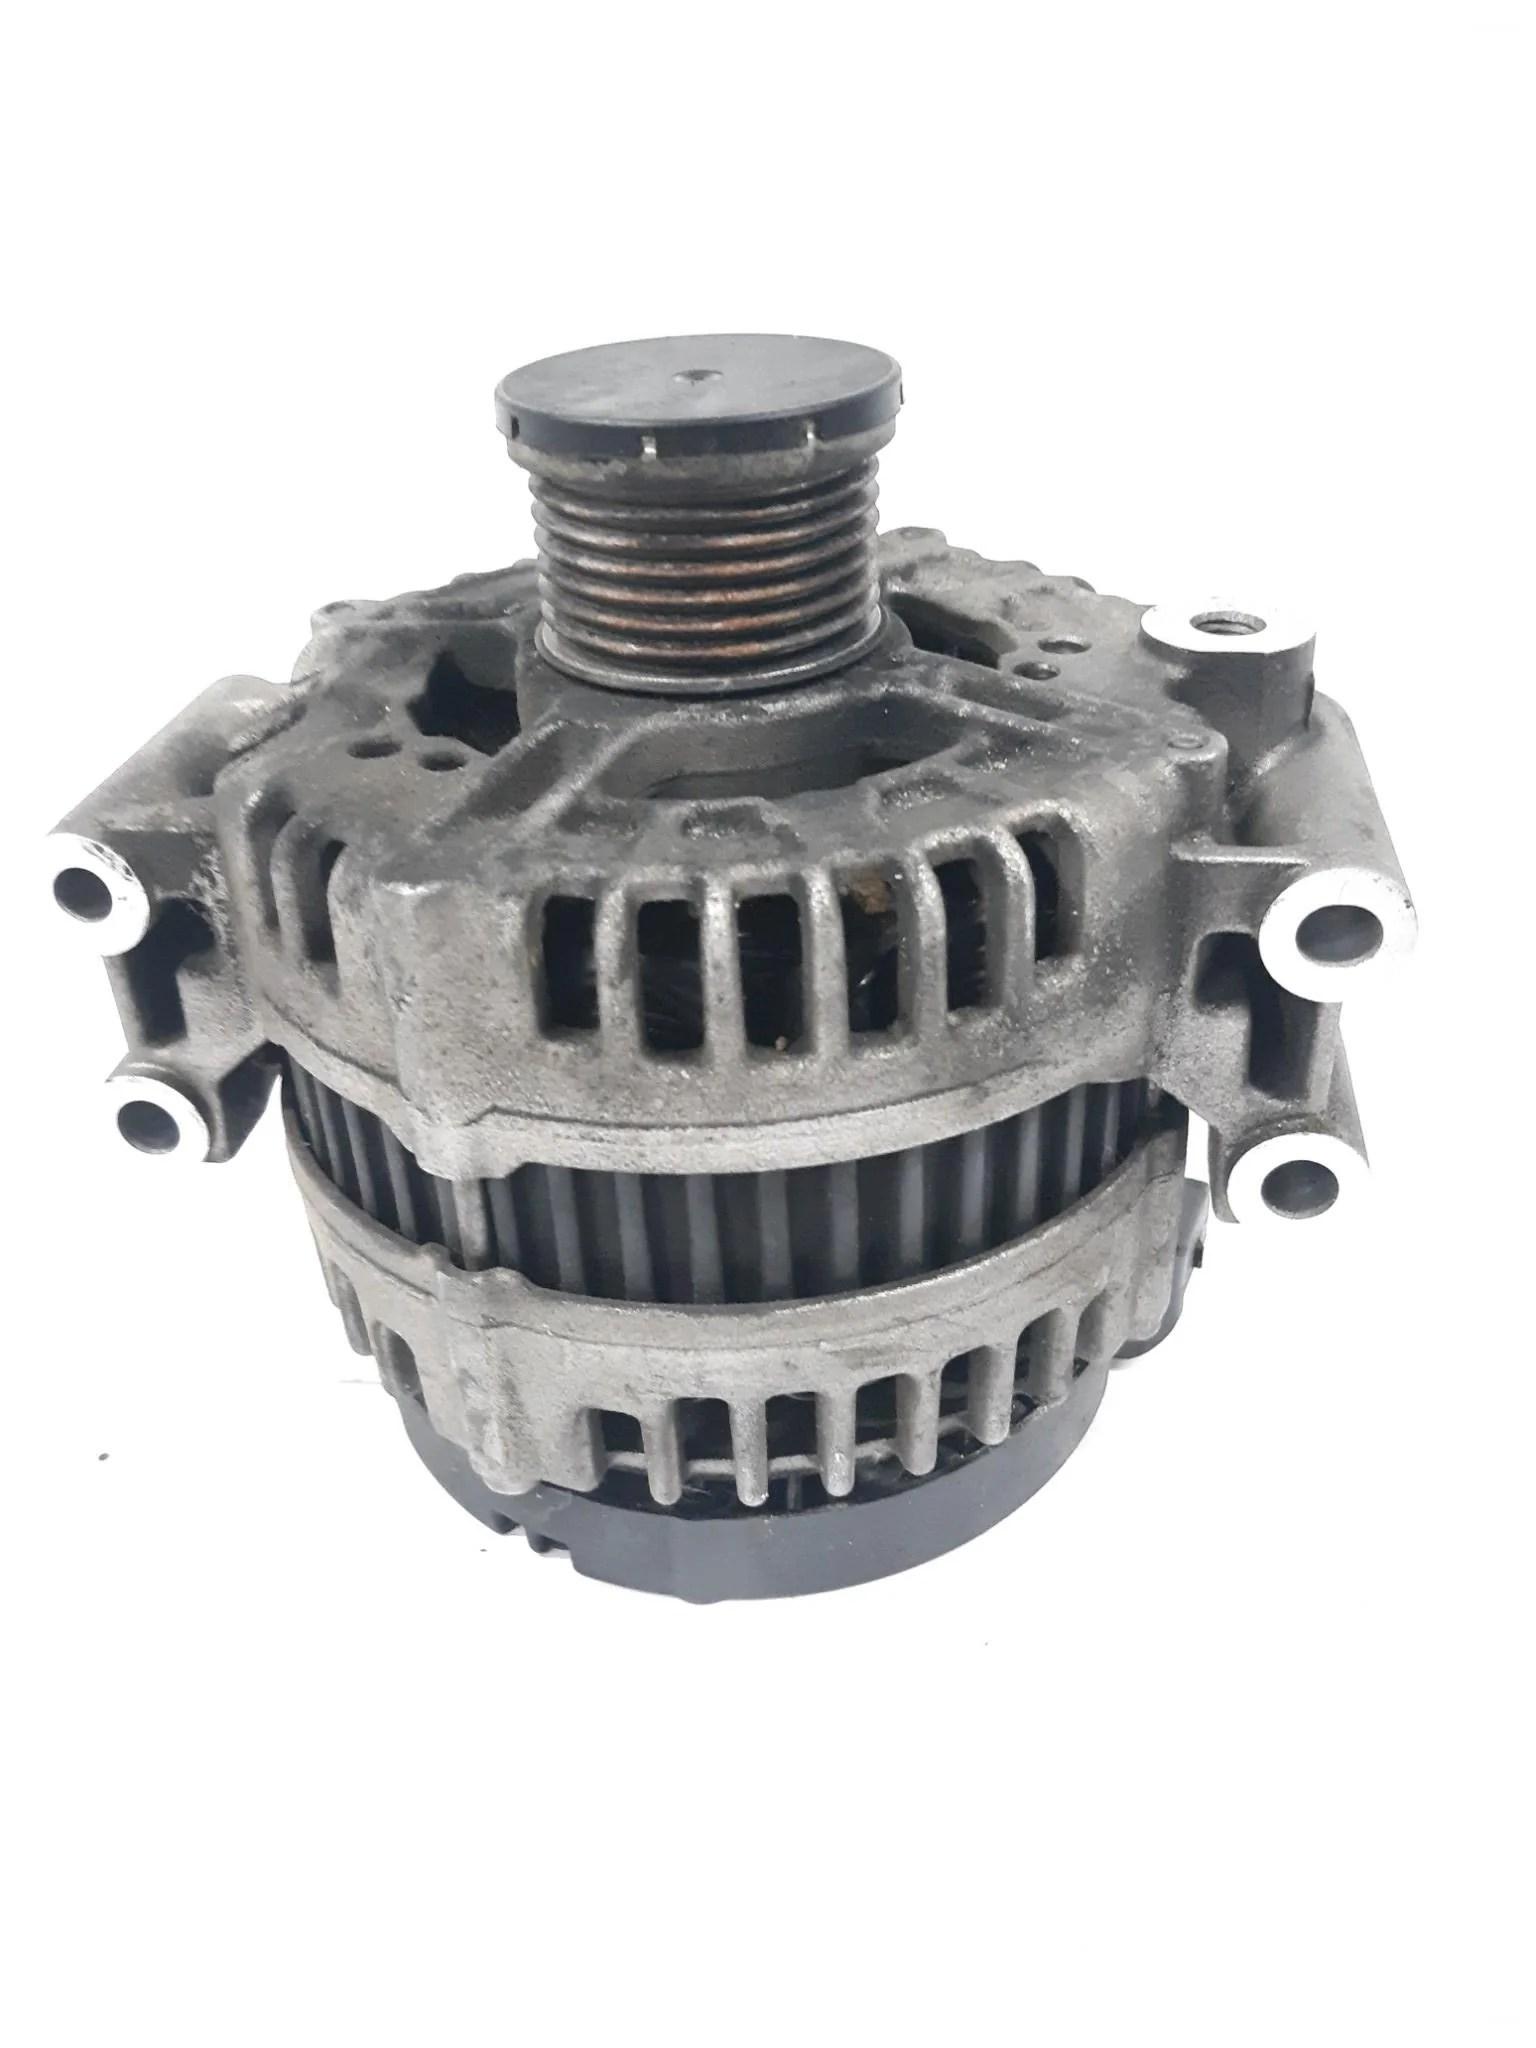 2007 Bmw 335i Alternator : alternator, 2007-2010, ALTERNATOR, GENERATOR, Parts